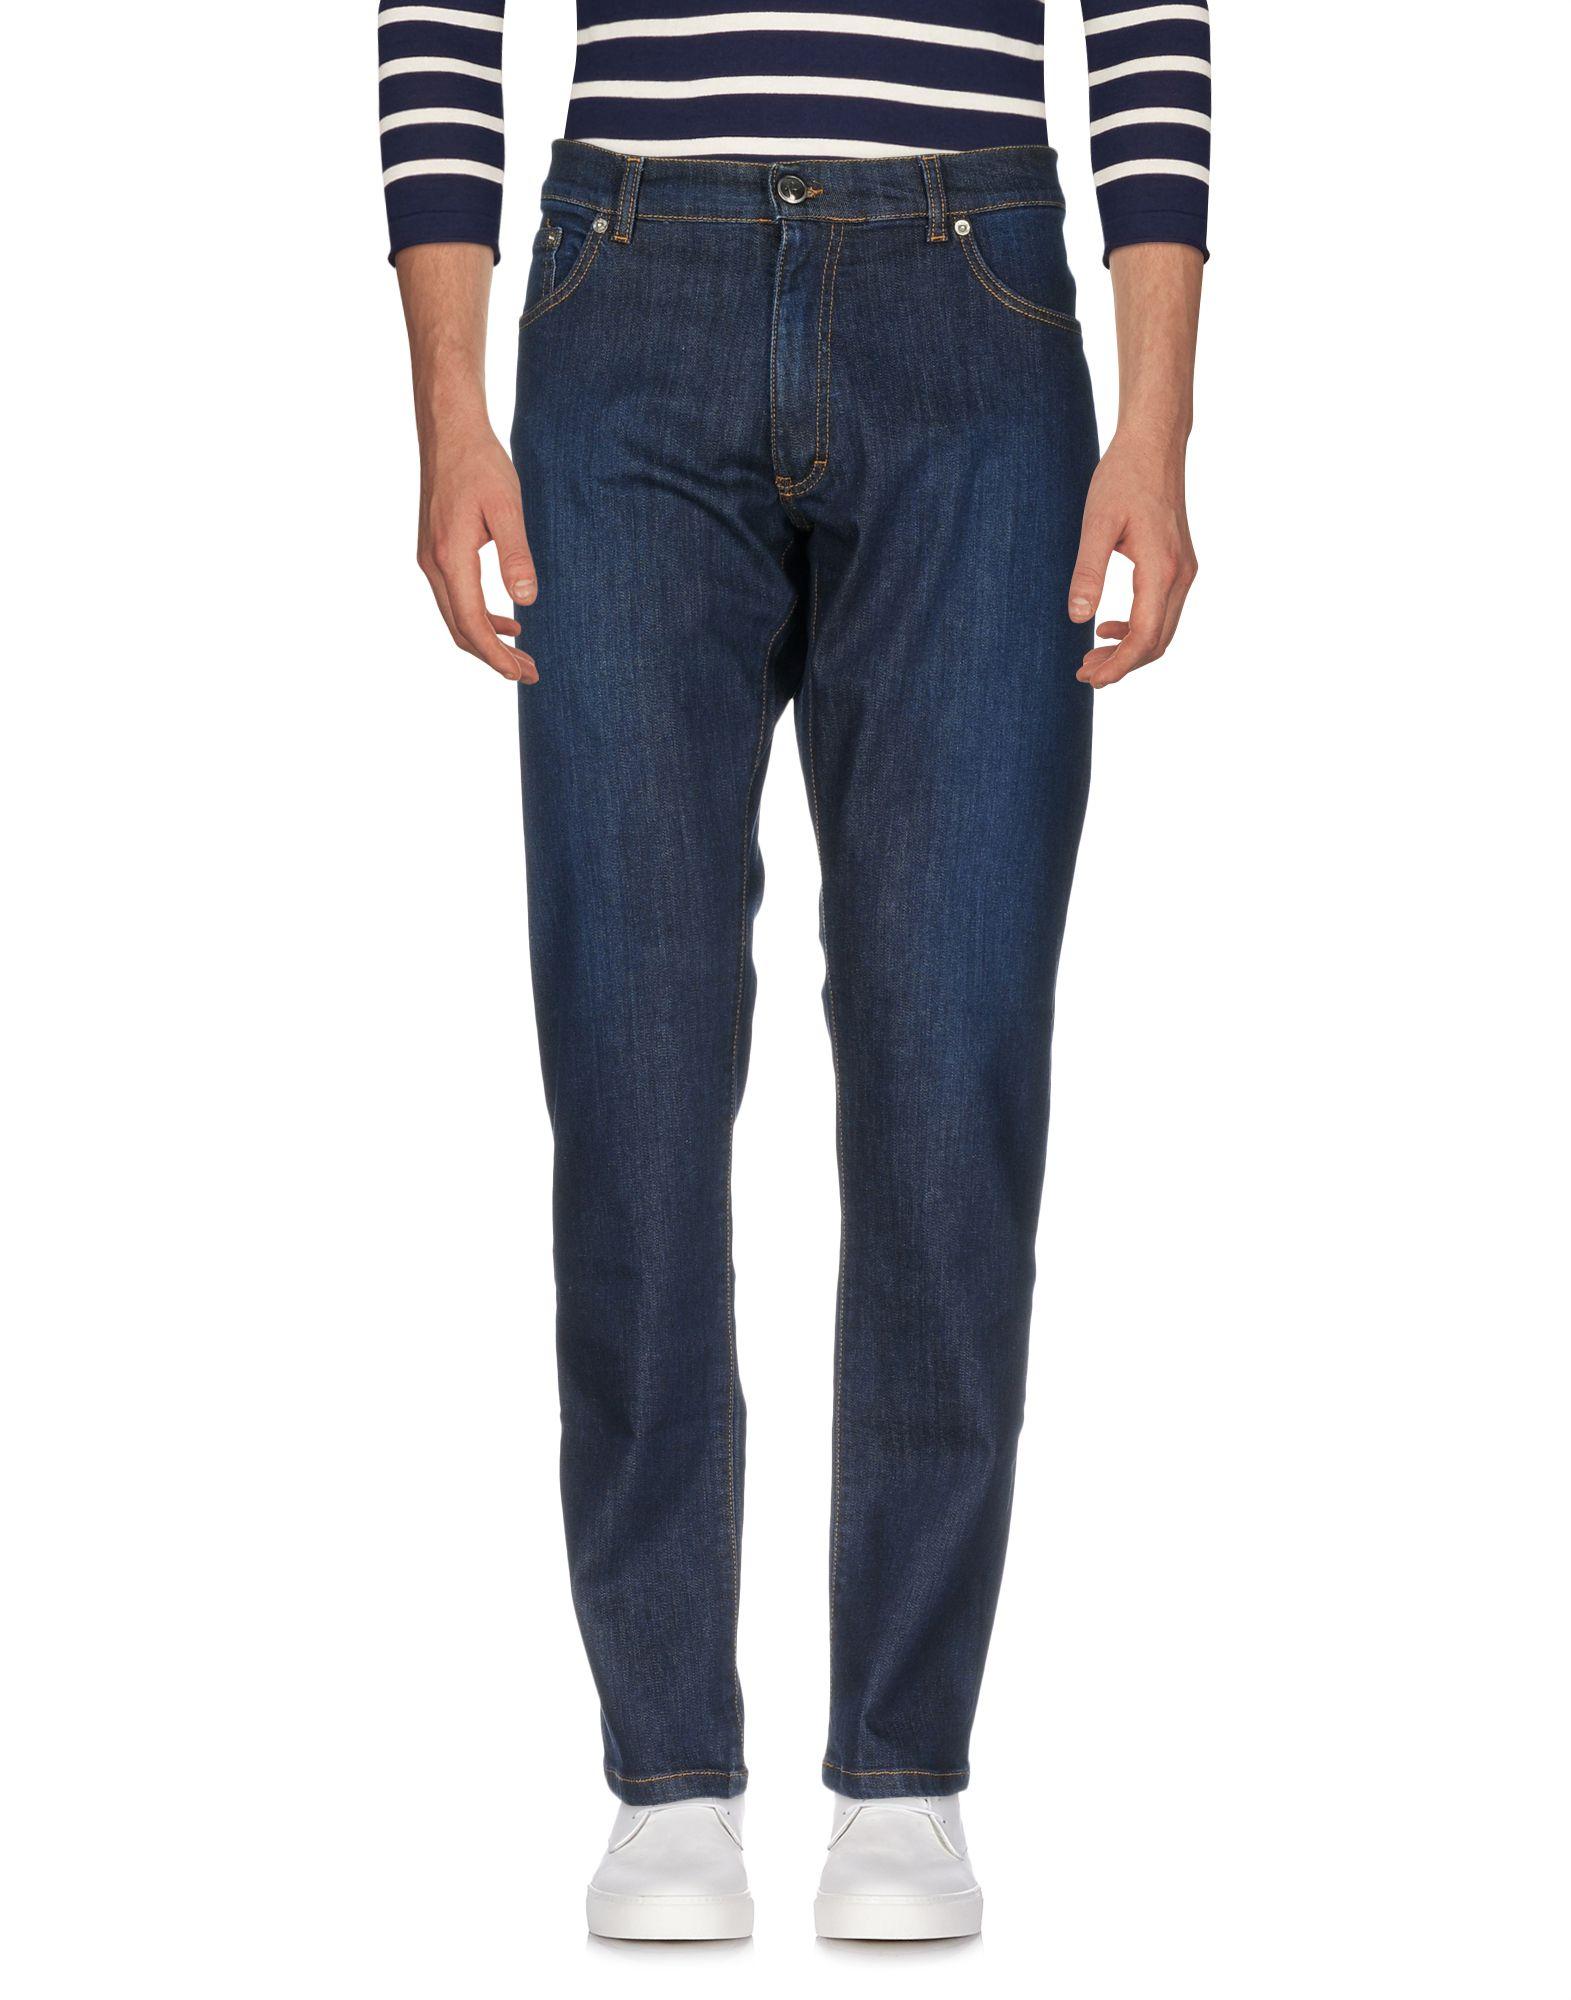 REPORTER Herren Jeanshose Farbe Blau Größe 14